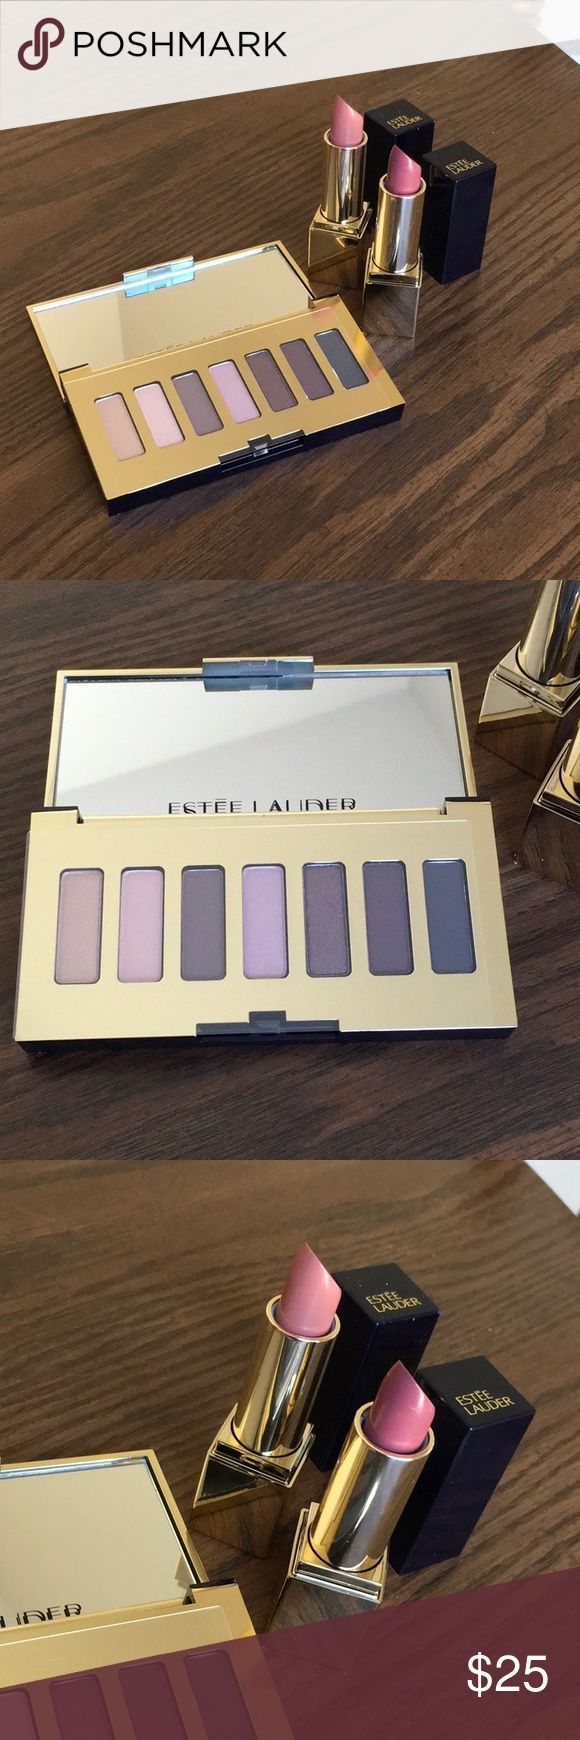 Estée Lauder Gift Estée Lauder Gift includes: Pure Color Envy Sculpting Eyeshadow Palette - Night (7 Eyeshadows) 0.01 oz and 2 Pure Color Envy Lipsticks (1) 110 Insatiable Ivory and (1) 440 Irresistible 0.12 oz each (originally $32 each!) All items are brand new! Estee Lauder Makeup